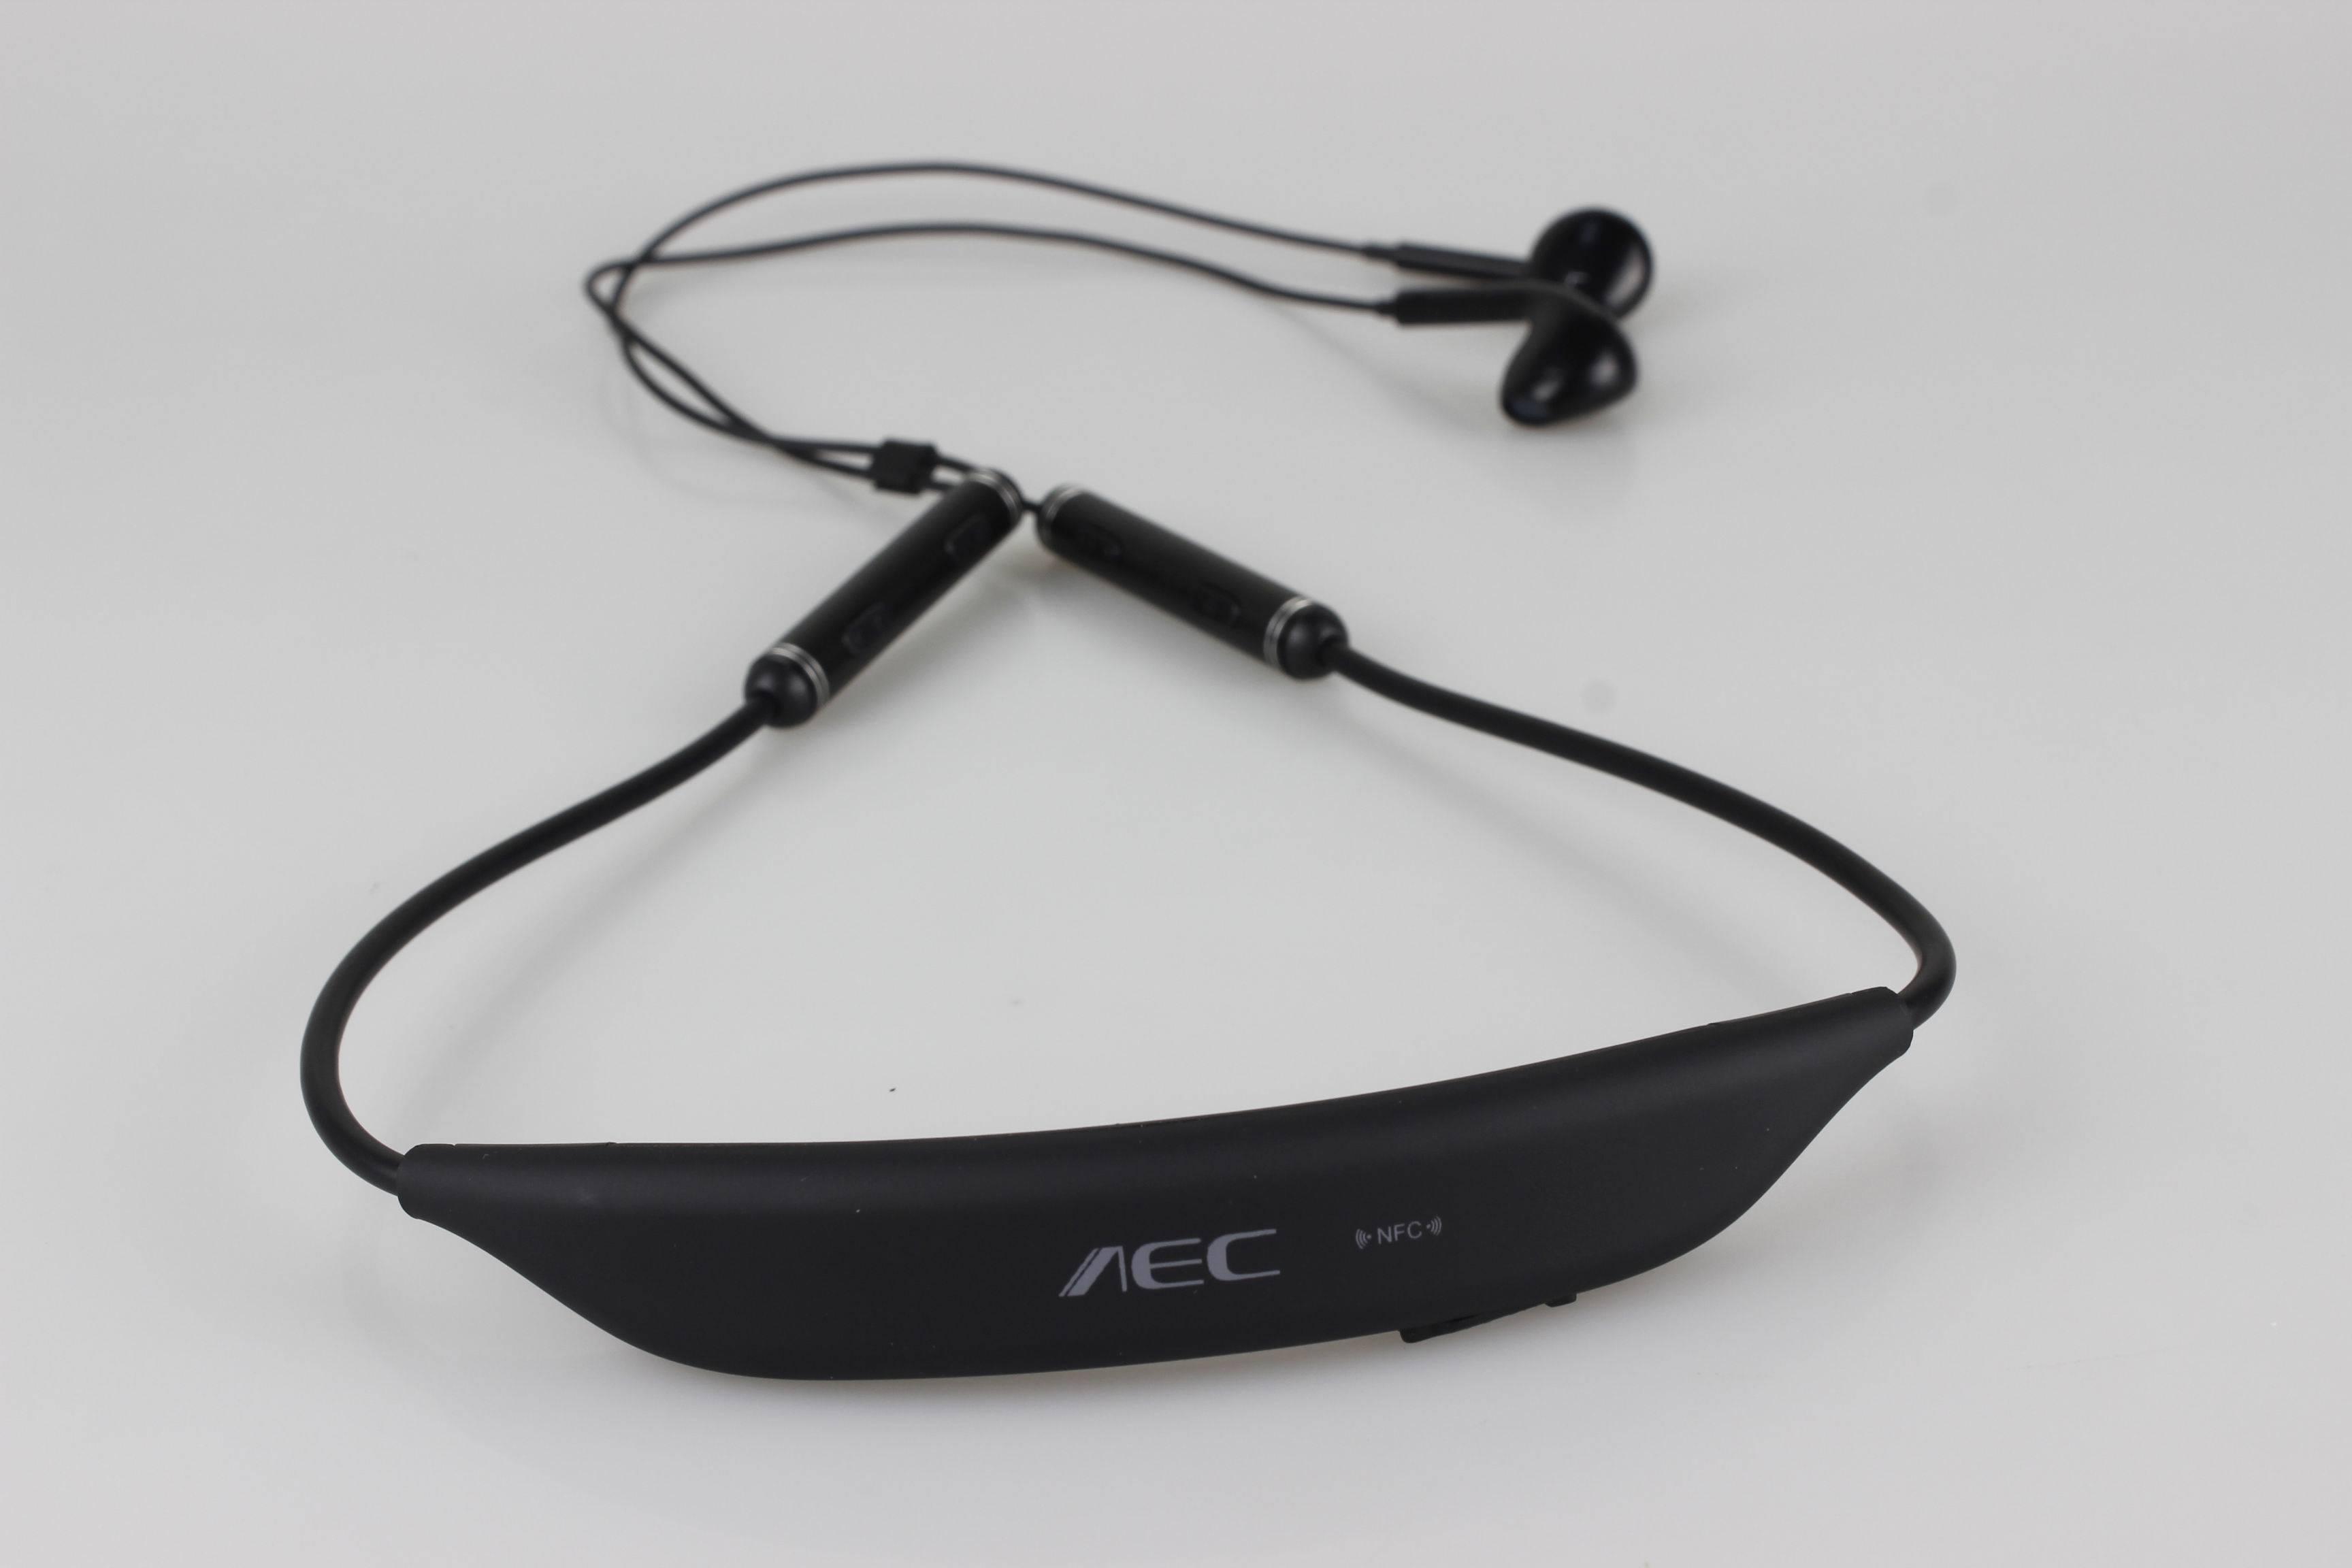 Noise Cancellation Wireless Neckband Hi-Fi Stereo Headset, Bluetooth 4.0 NFC Headphones